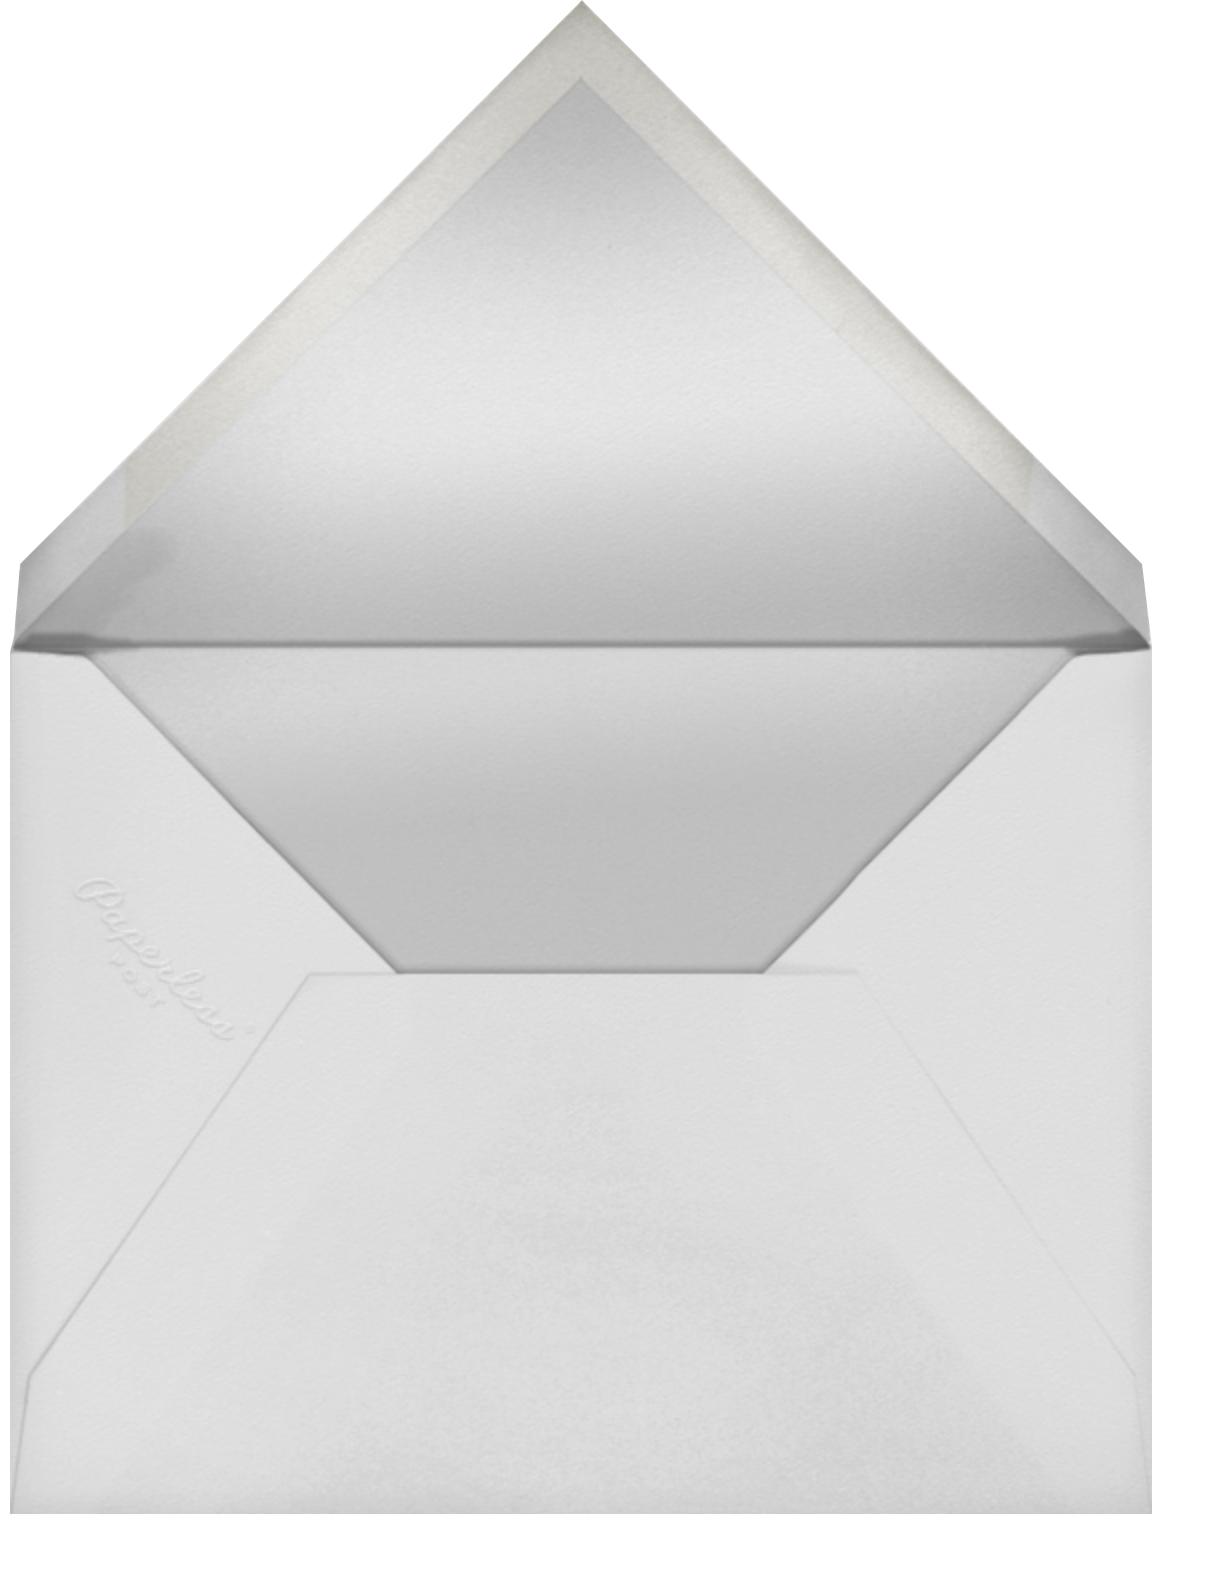 Fette (Menu) - Gold/White - Kelly Wearstler - Menus and programs - envelope back